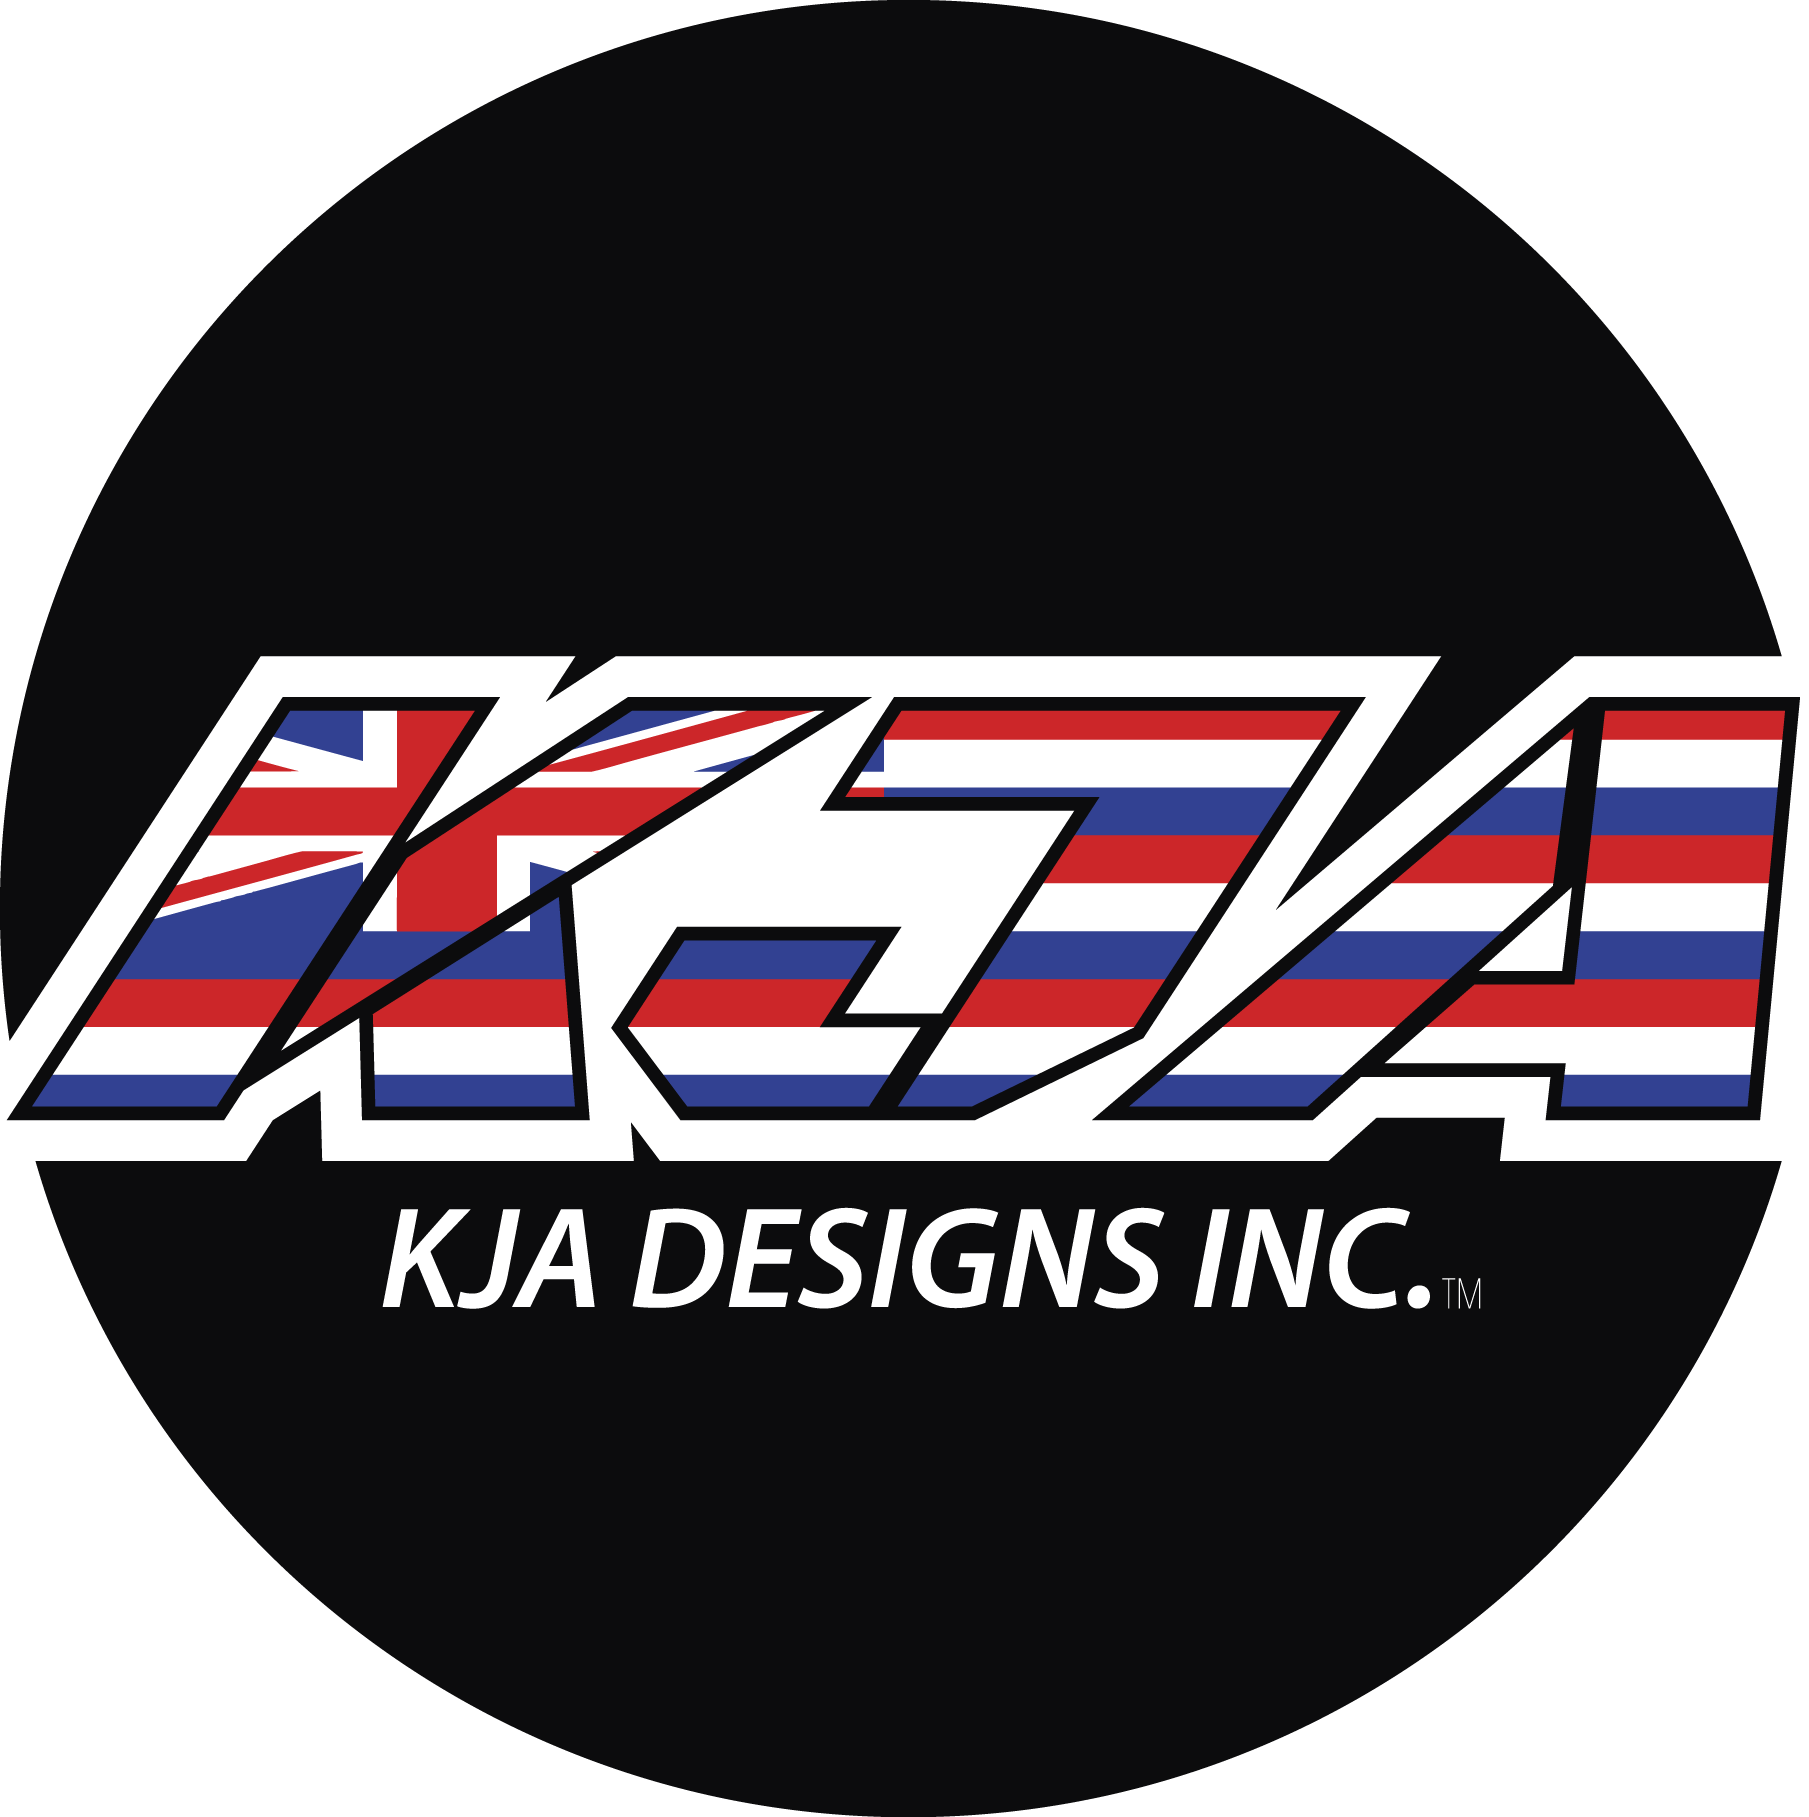 KJA Designs Inc.™ 4B on site